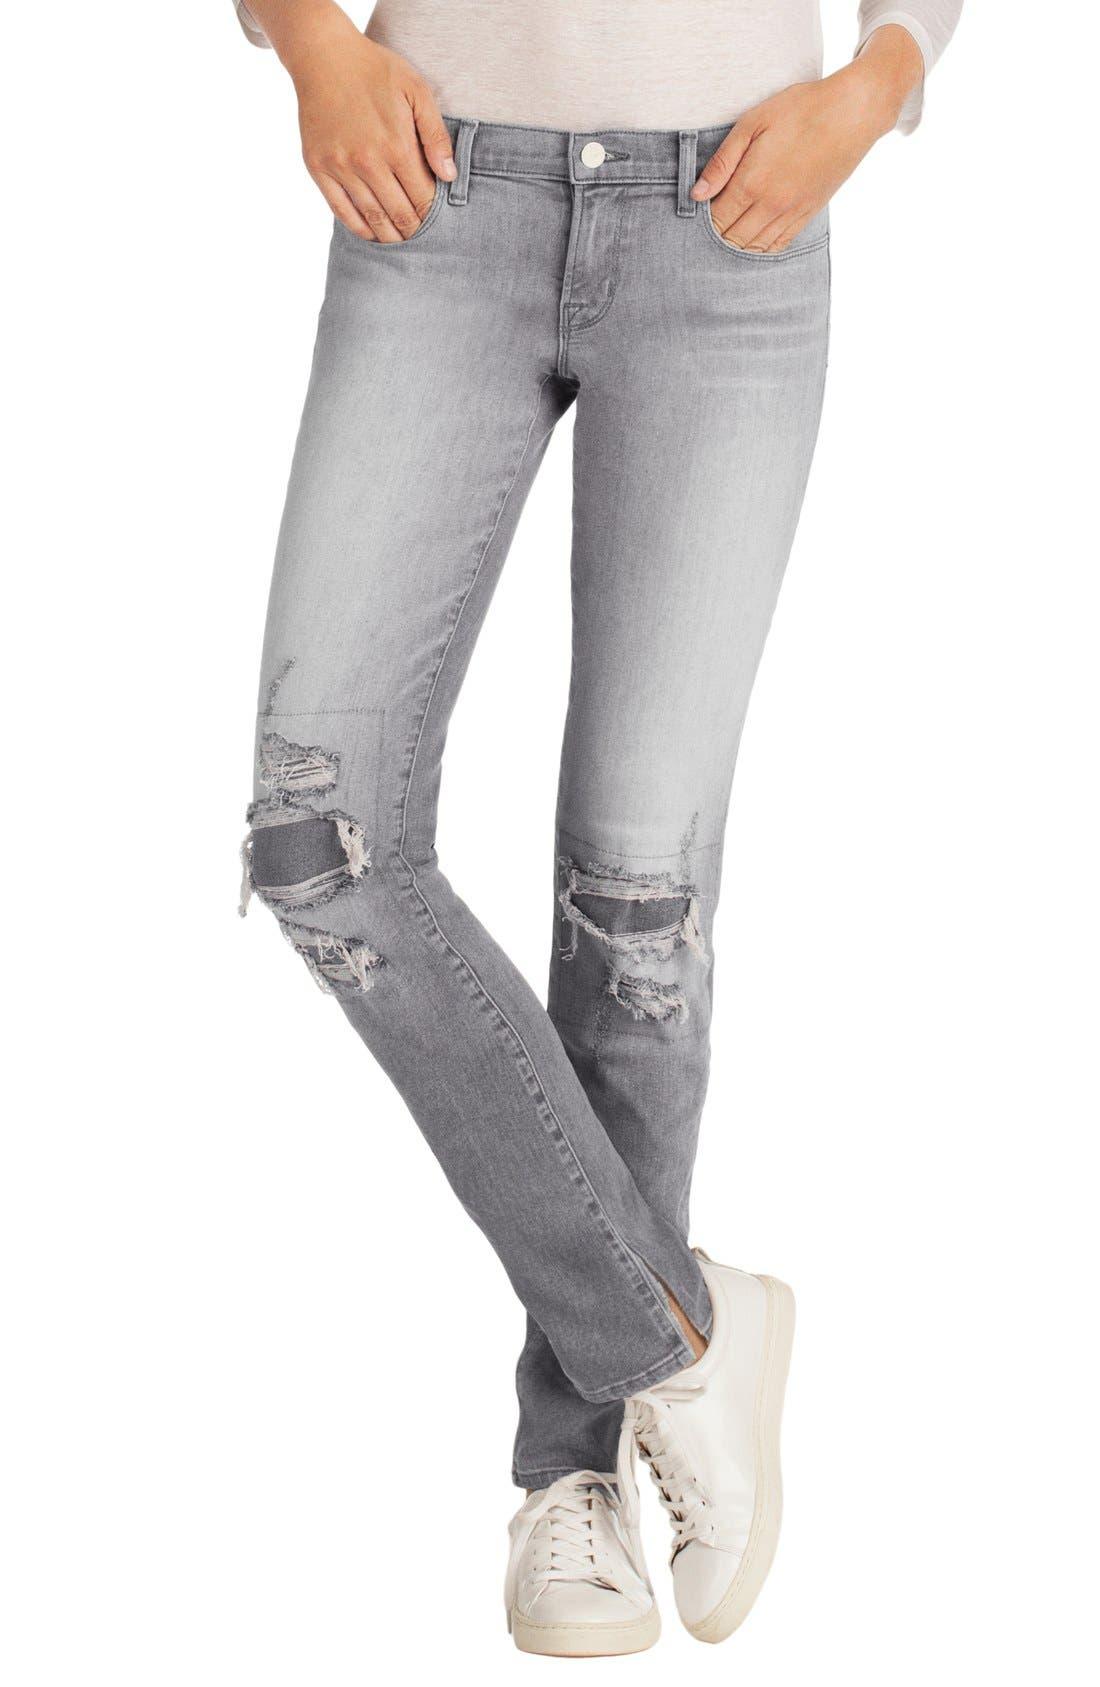 Alternate Image 1 Selected - J Brand Destructed Mid Rise Jeans (Sweet)